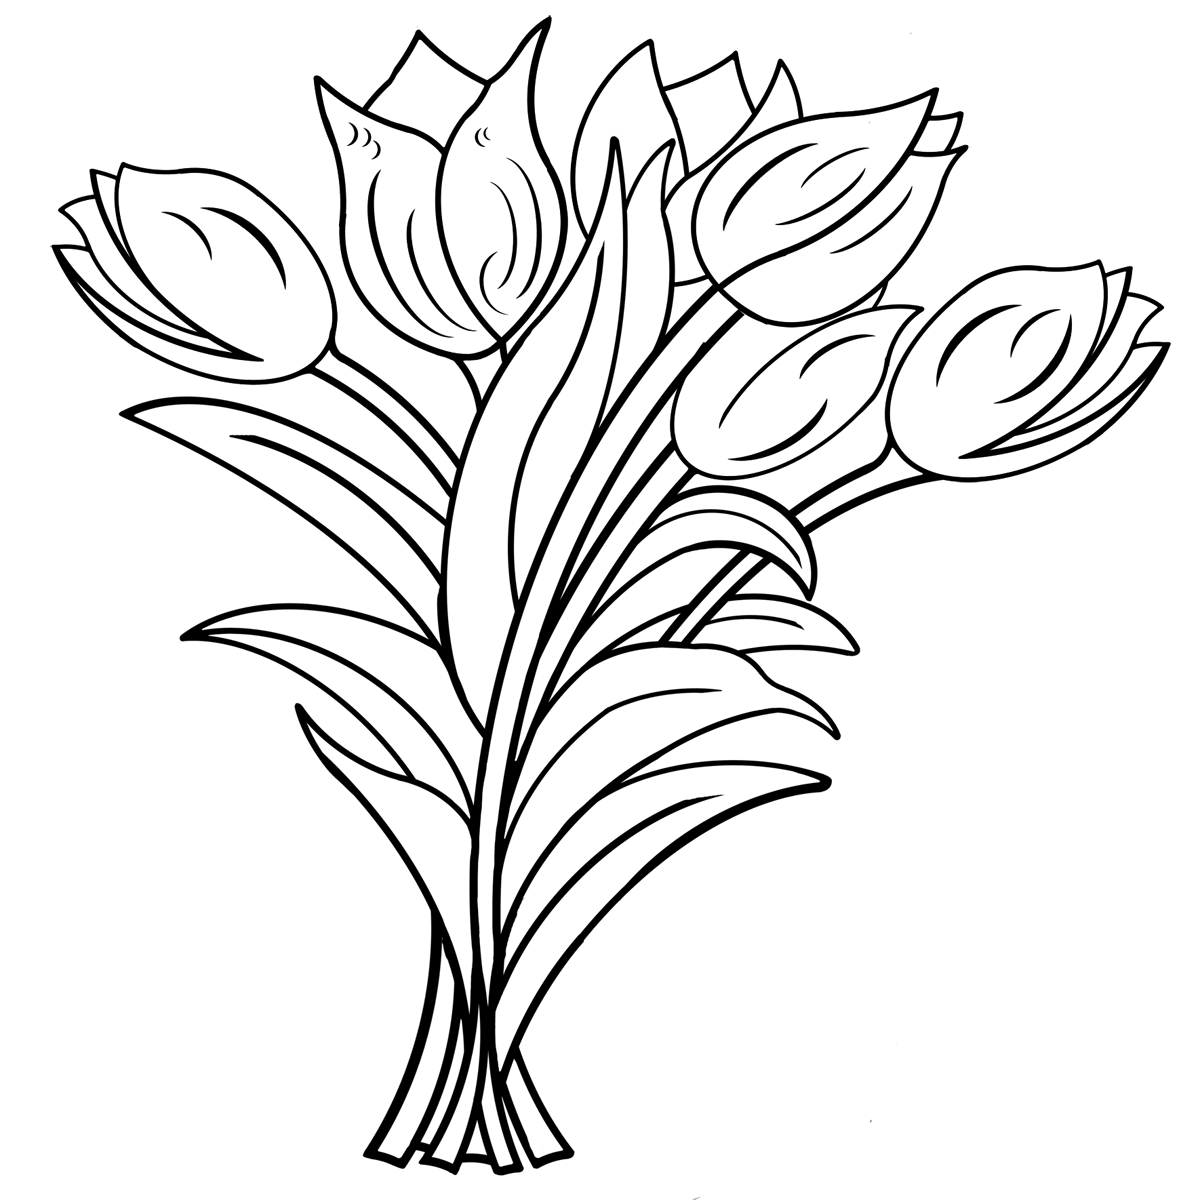 malvorlage tulpenstrauß  Coloring and Malvorlagan